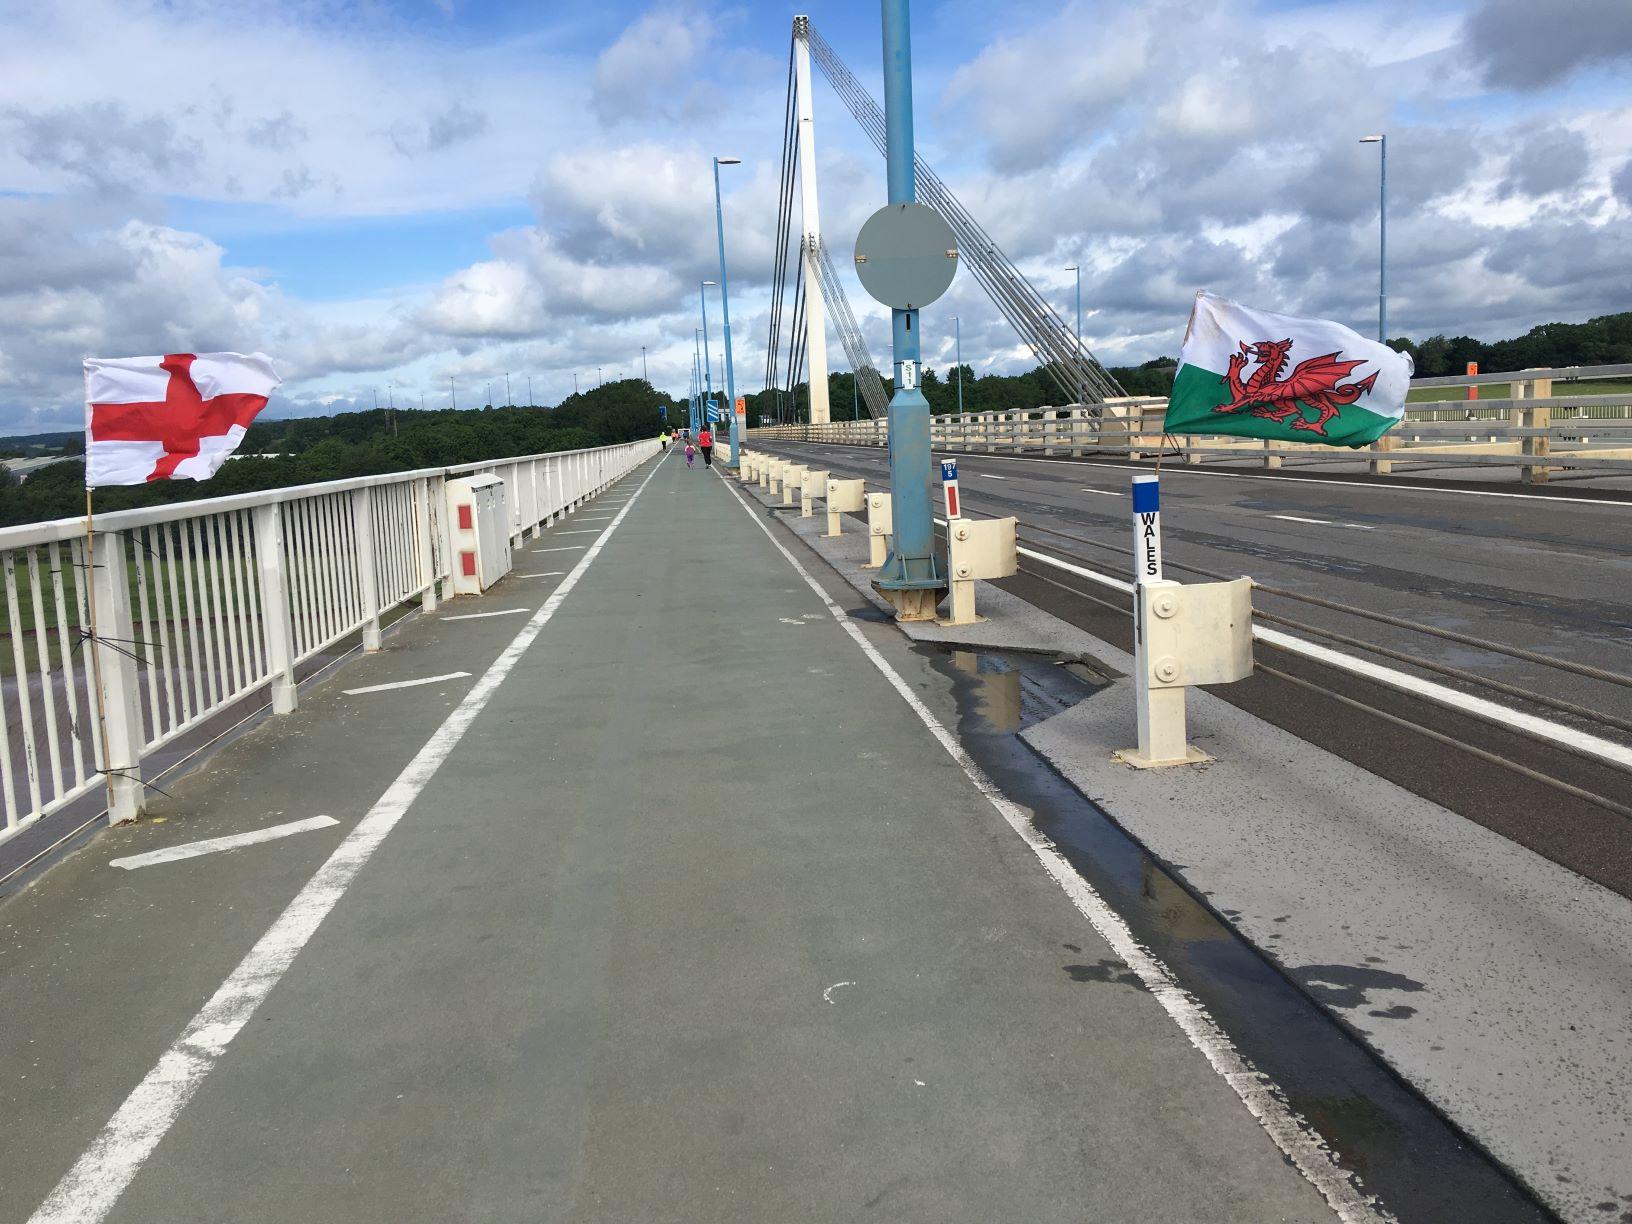 June | 2019 | Severn Bridge parkrun